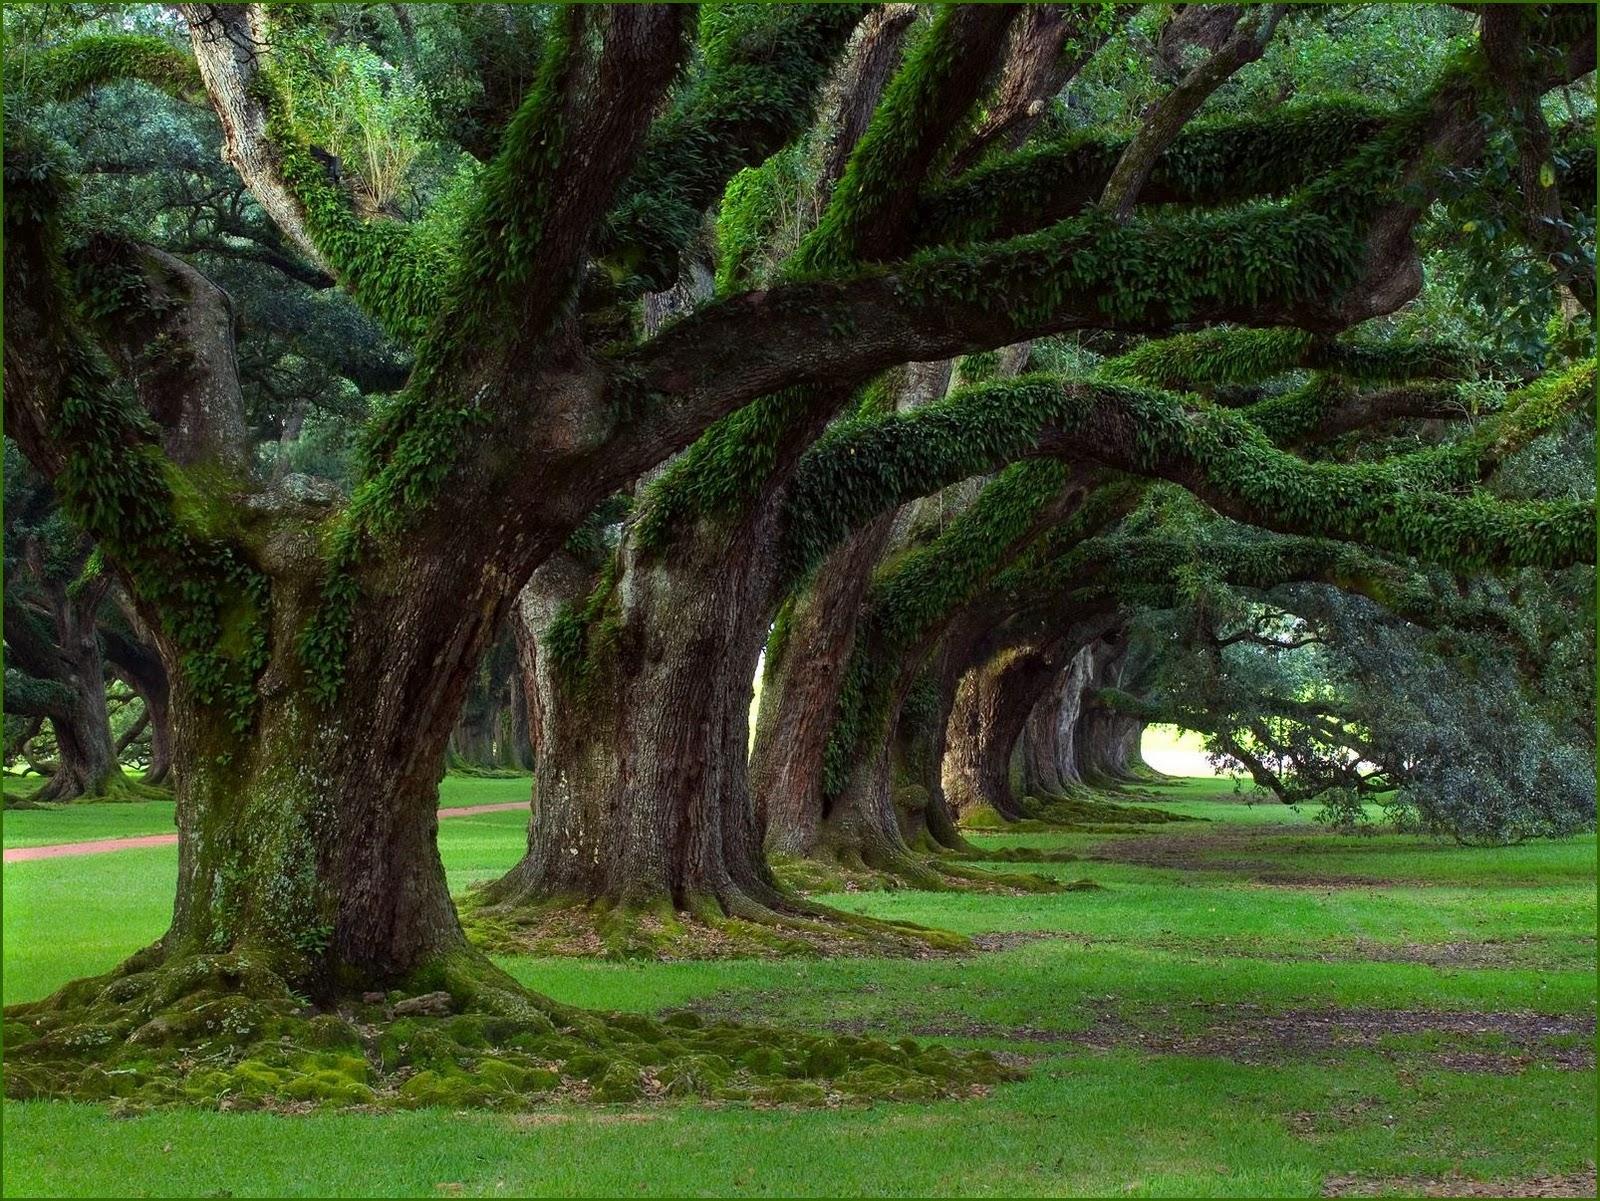 http://3.bp.blogspot.com/_sRGU_JXOz6E/TRTdmBsIXeI/AAAAAAAAATw/ElNax5_xJXk/s1600/Wallpaper-Nature-Trees.jpg